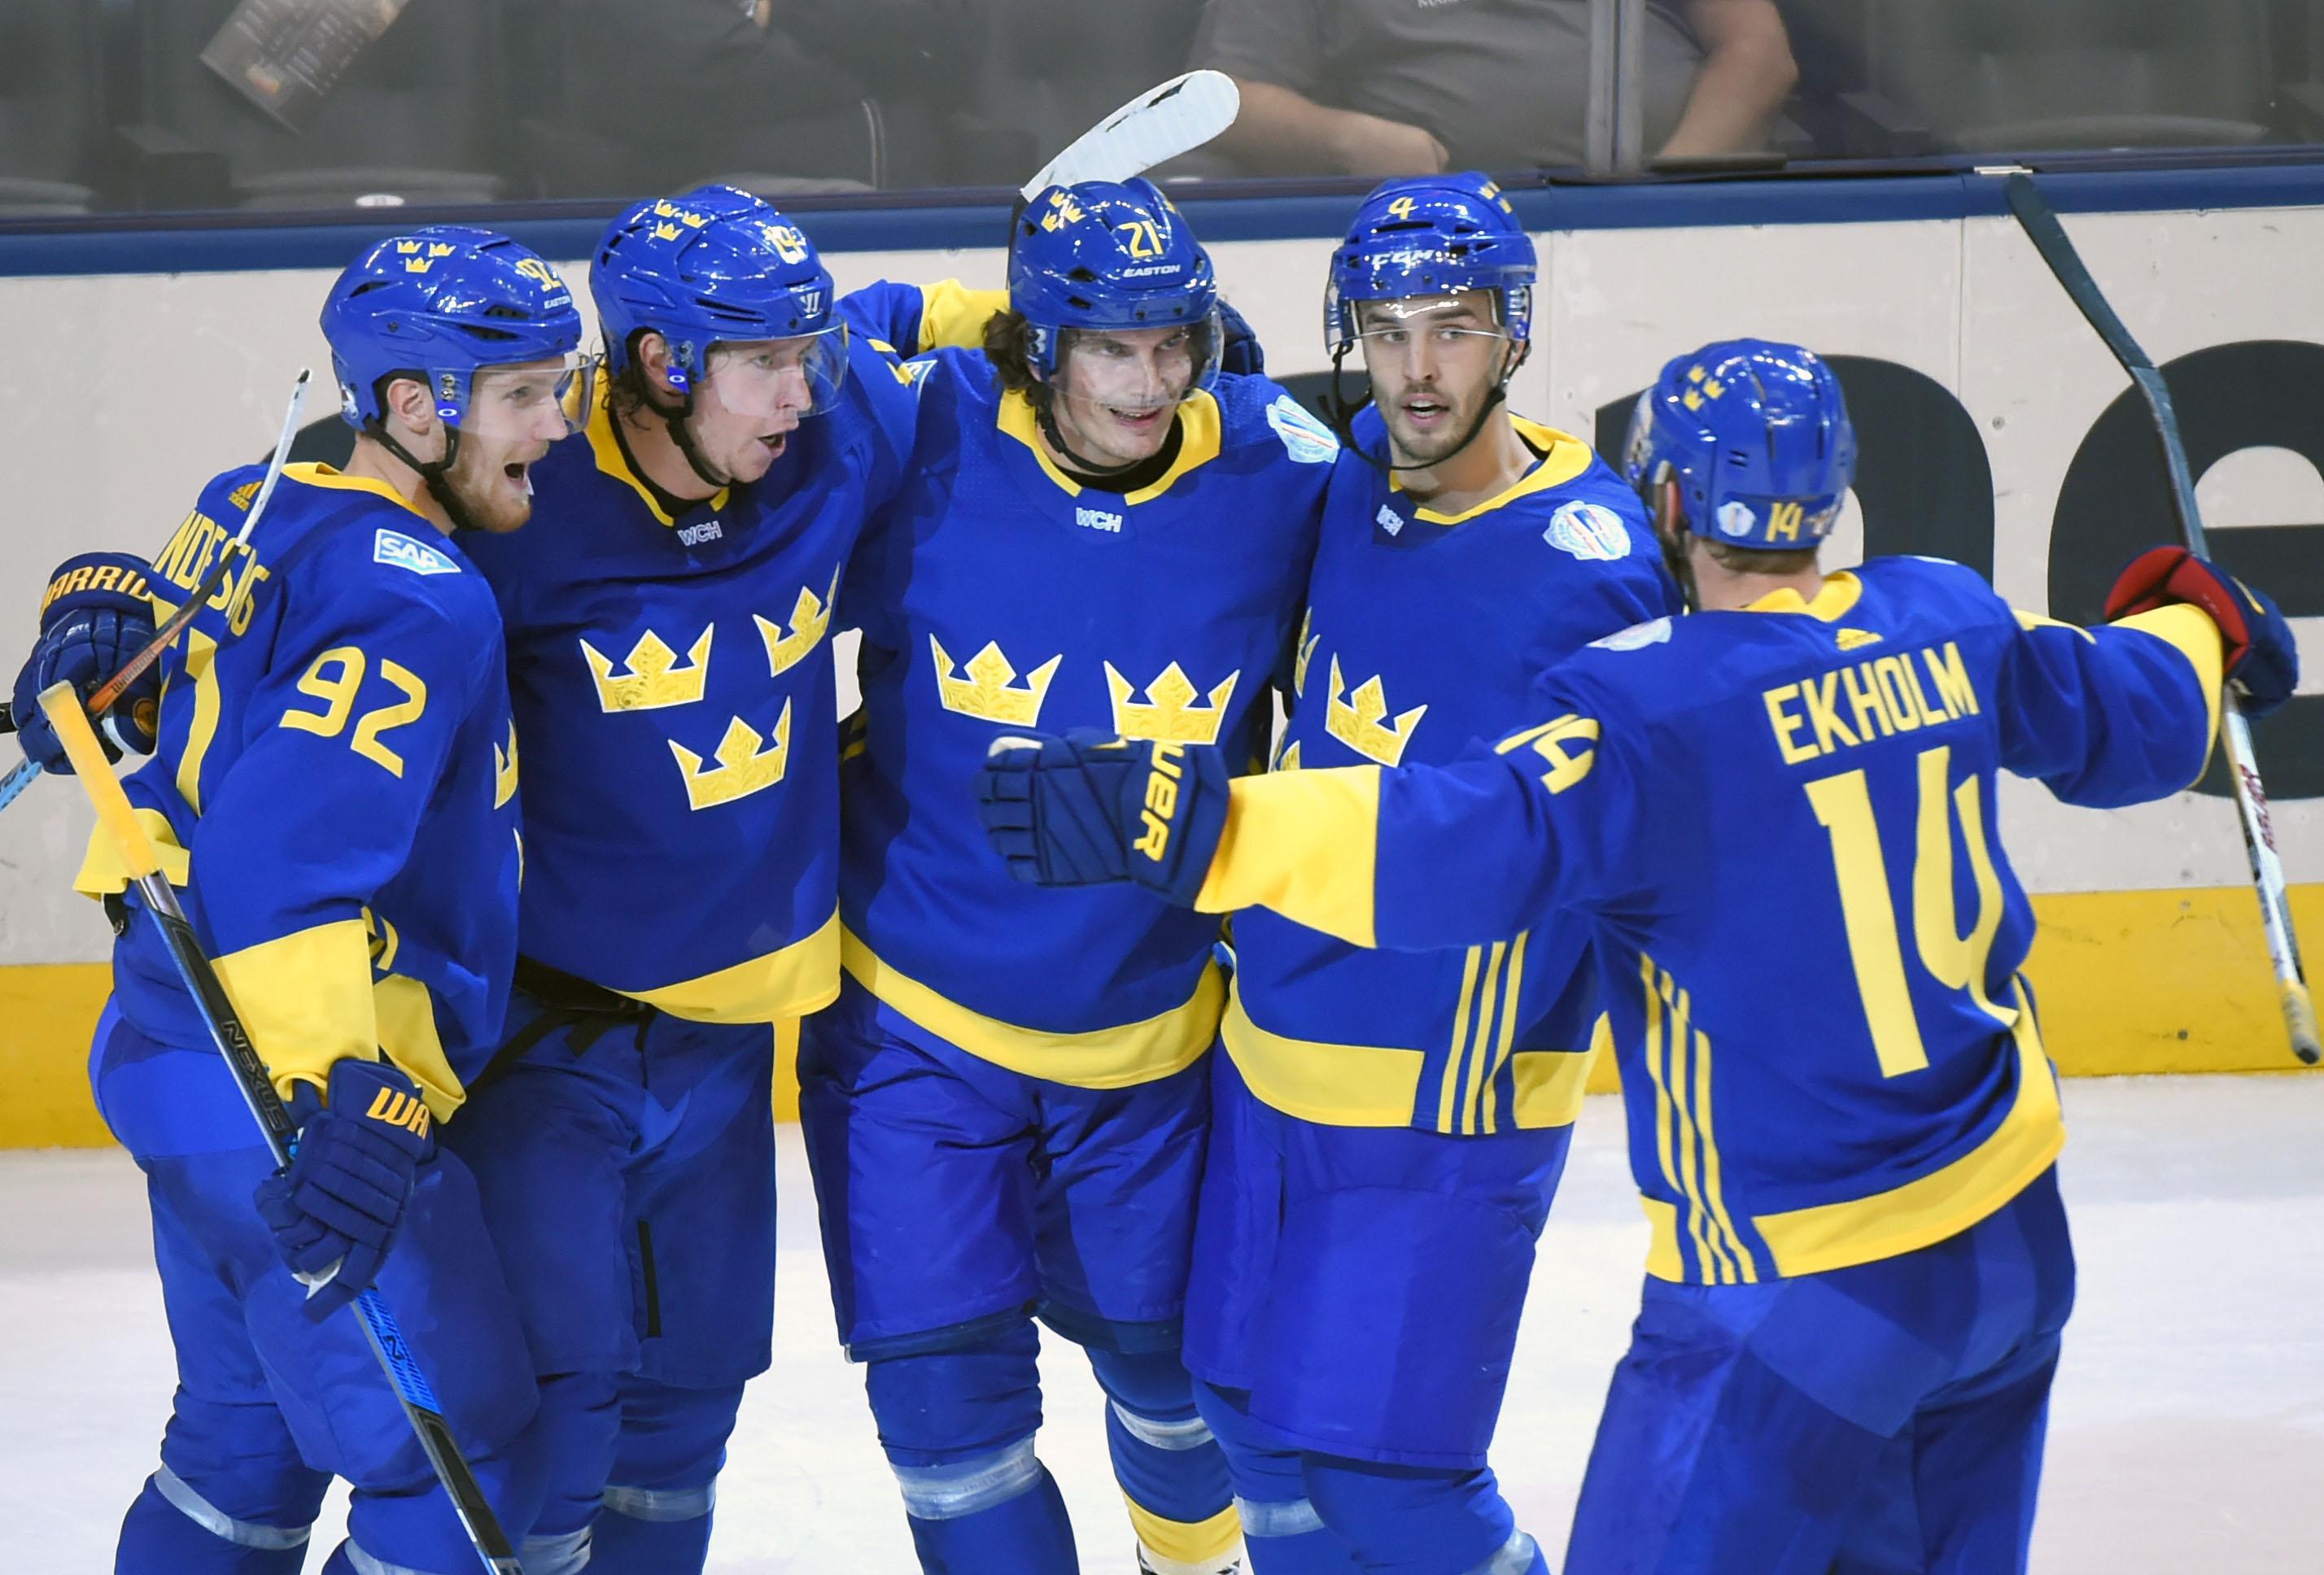 Hockey: World Cup of Hockey-Team Finland vs Team Sweden